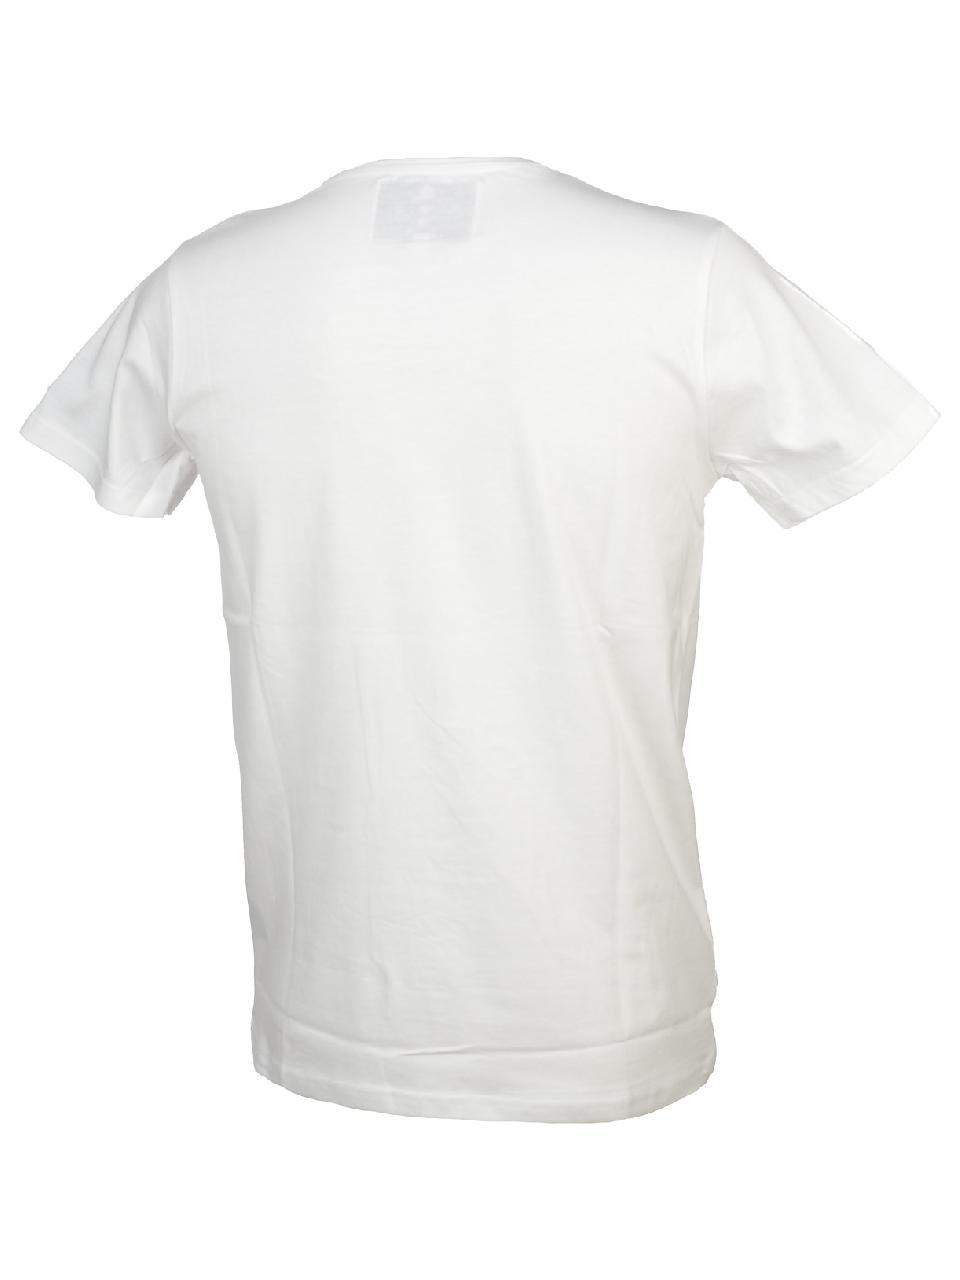 Short-Hite-Couture-Madiner-White-Mc-Tee-White-11526-New thumbnail 5